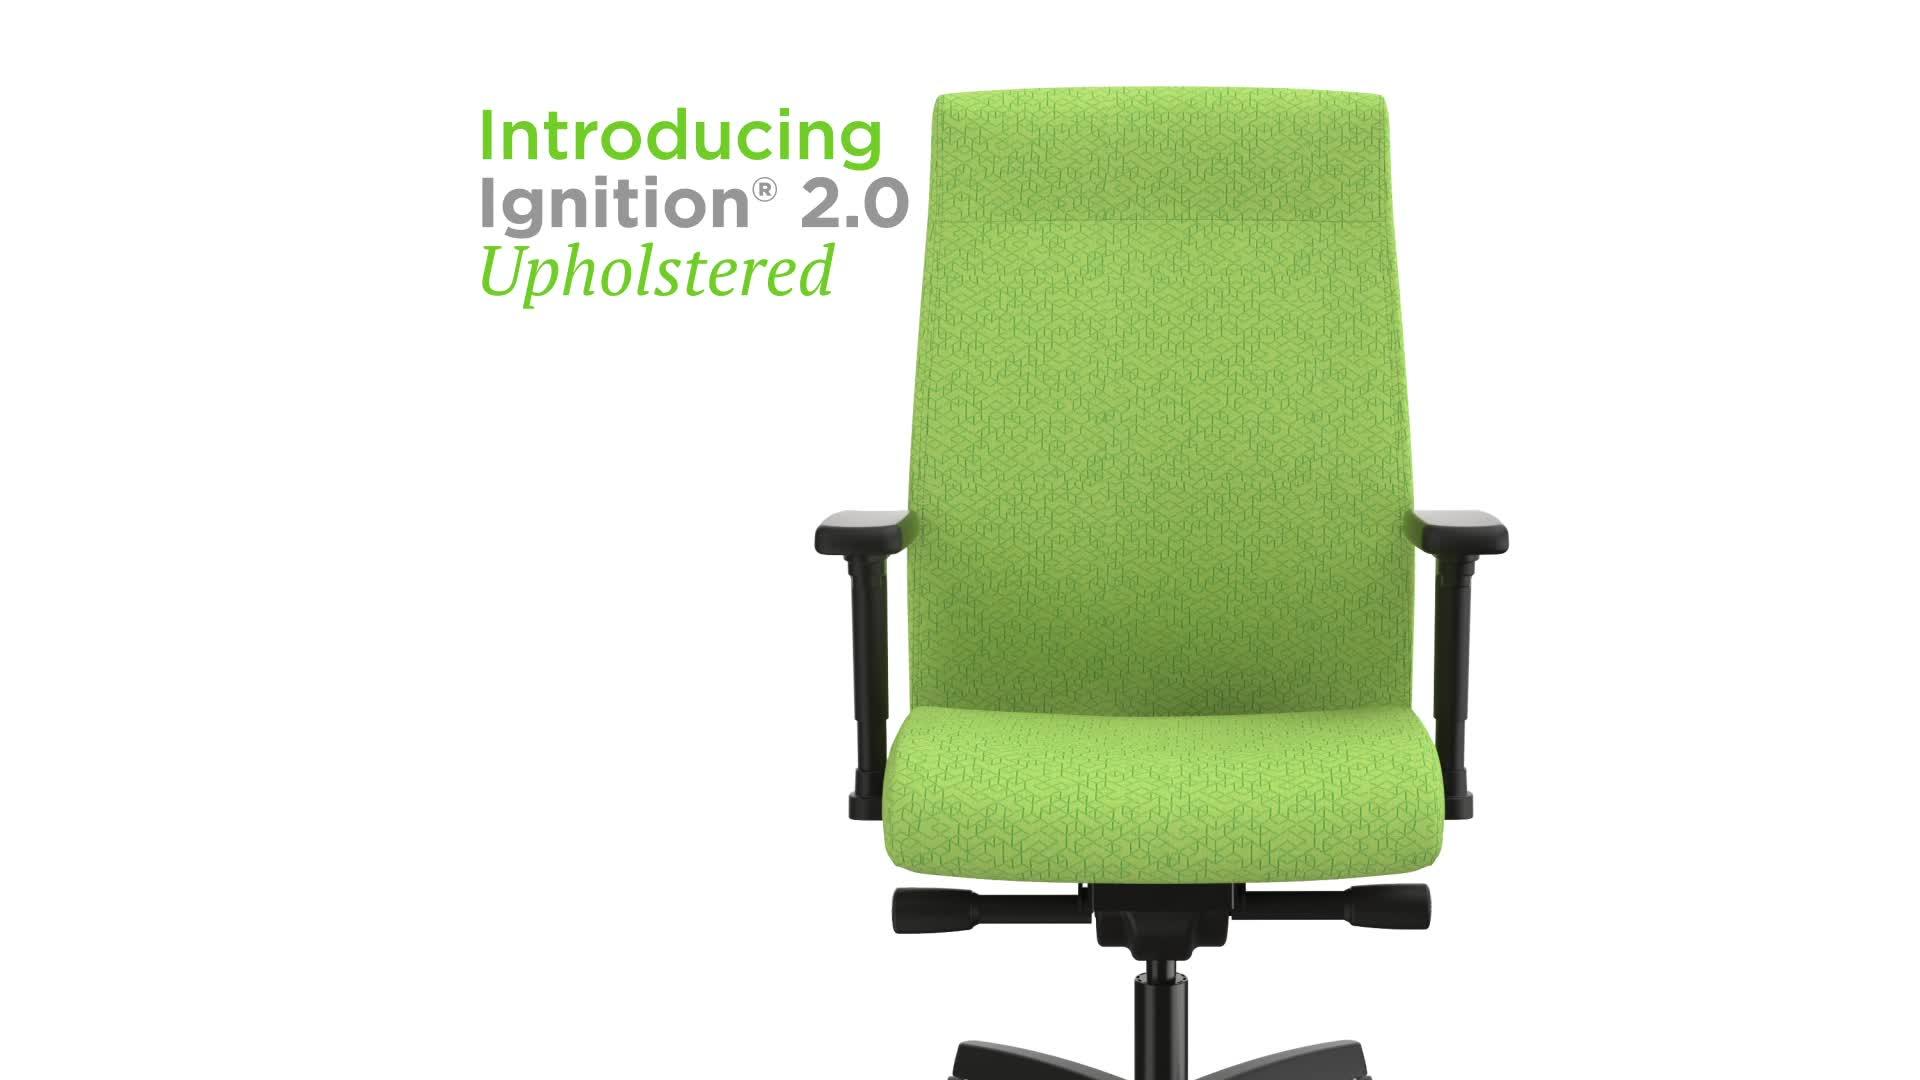 Ignition 2.0 Upholstered Animation video link